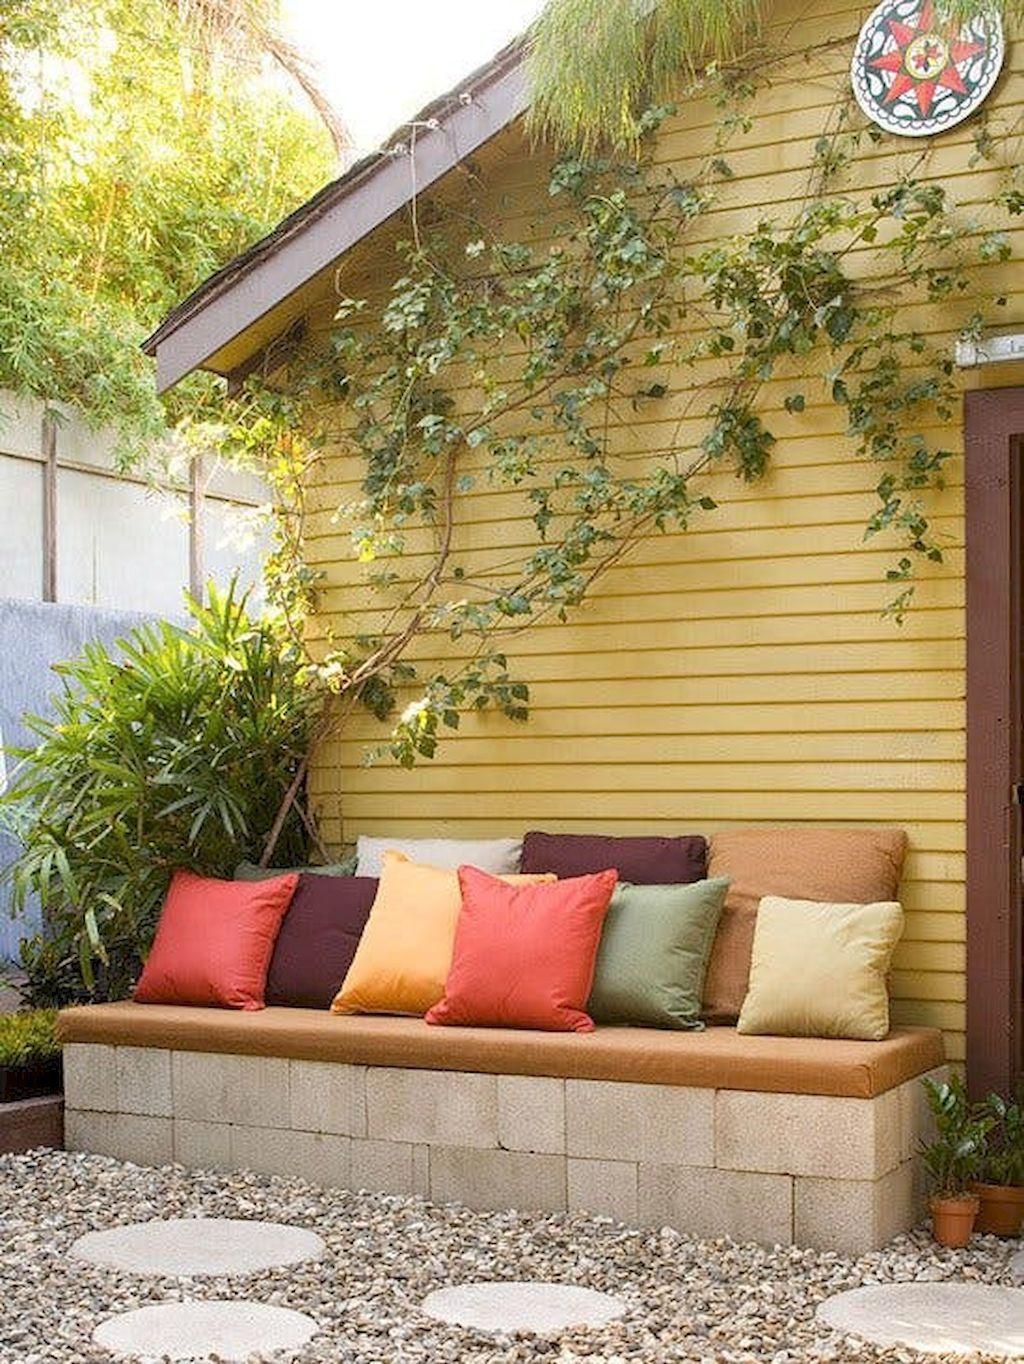 75 Creative DIY Cinder Block Furniture and Decor Ideas | Cinder ...